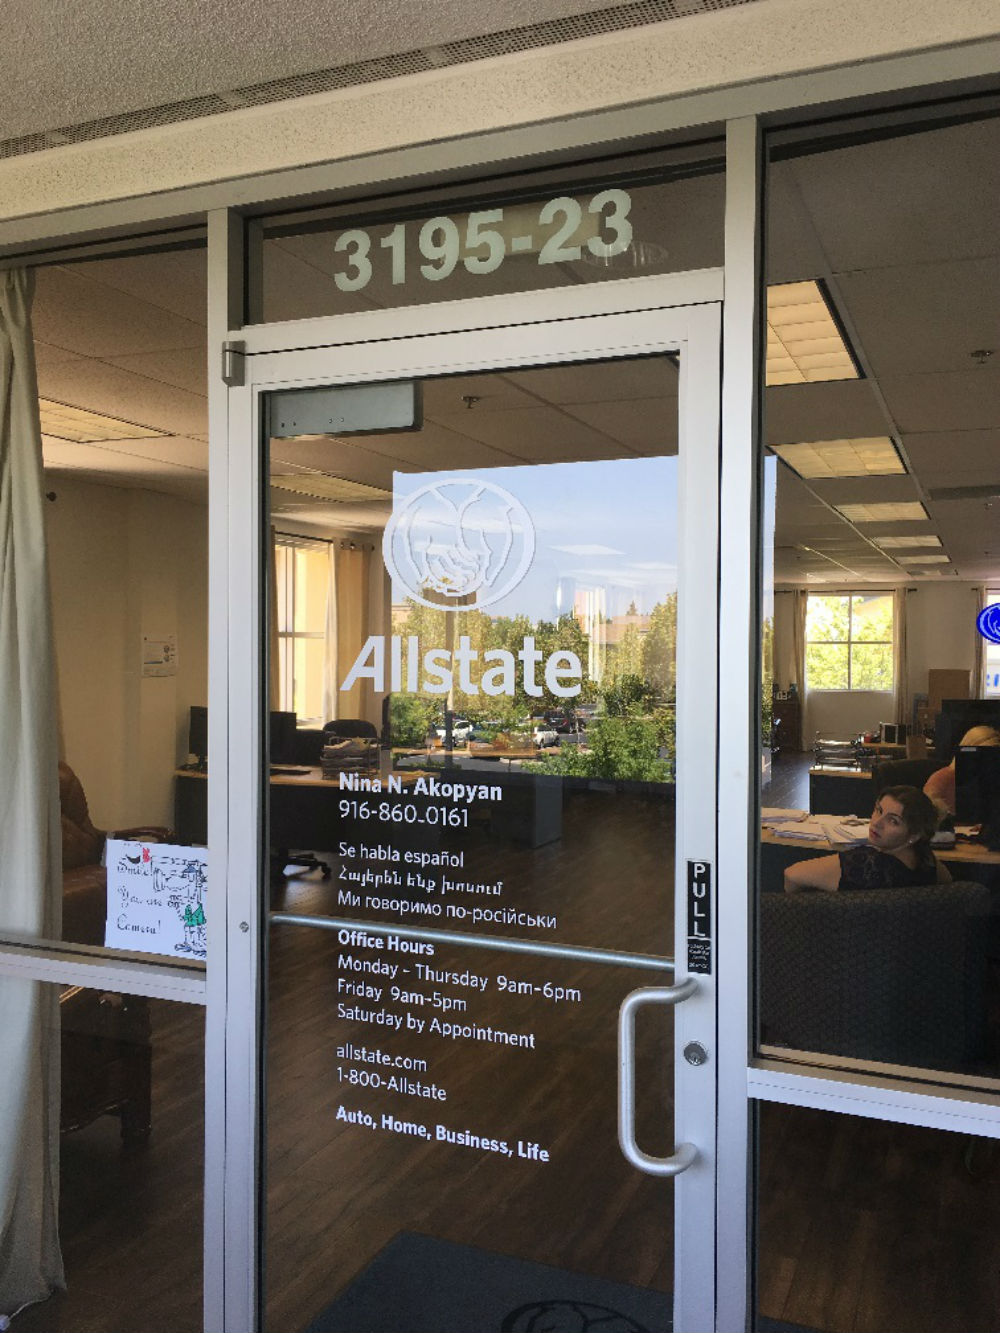 Allstate Insurance Agent: Nina Akopyan image 1